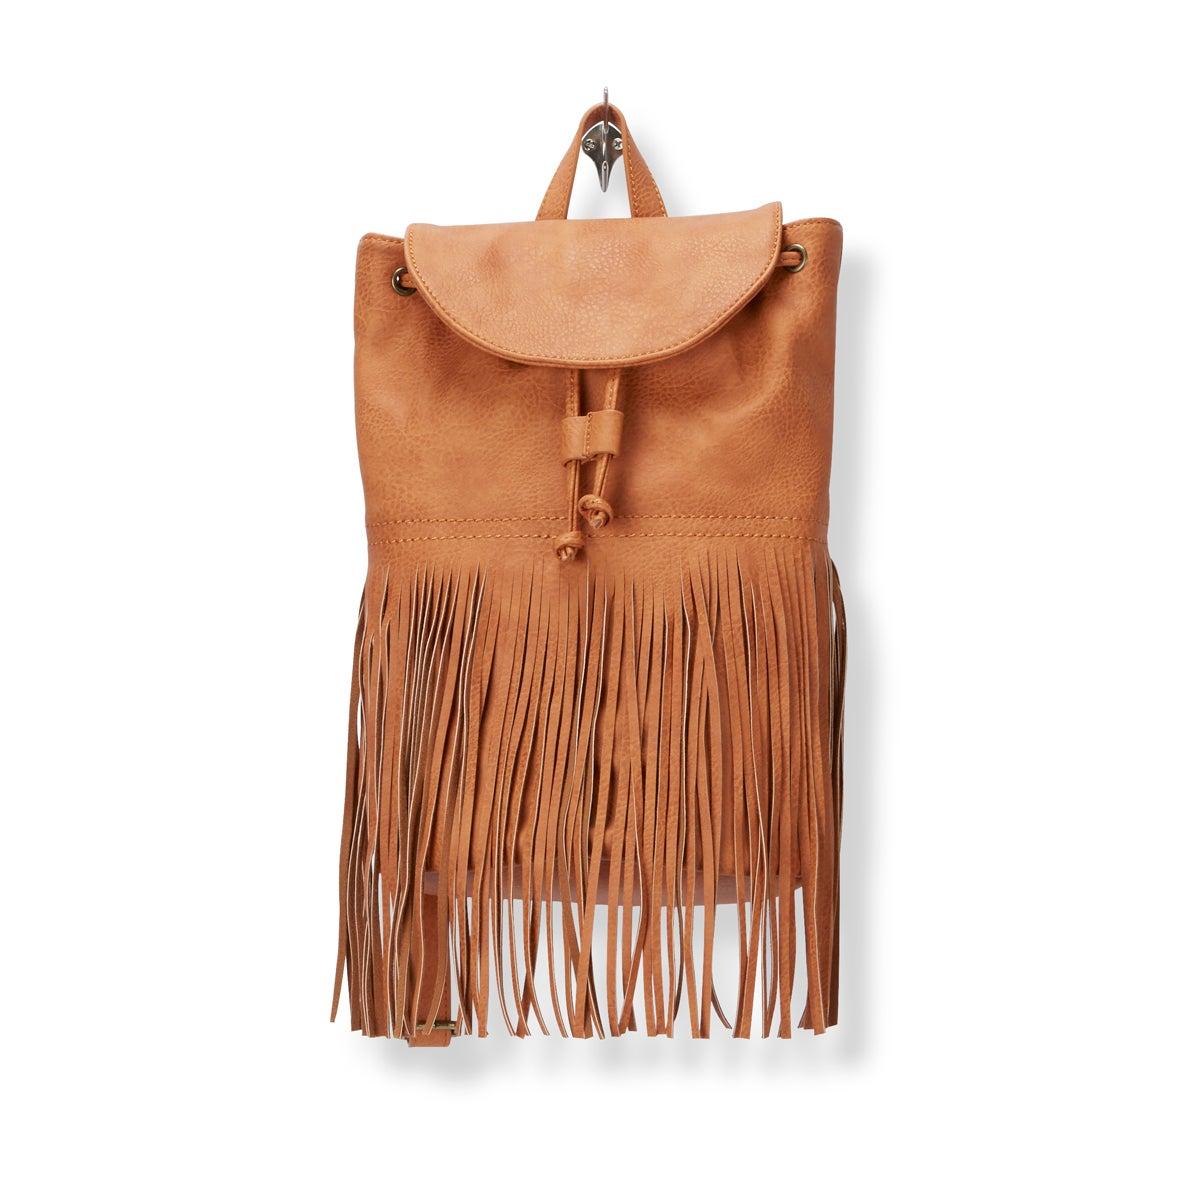 Lds Fringe Frenzy camel backpack